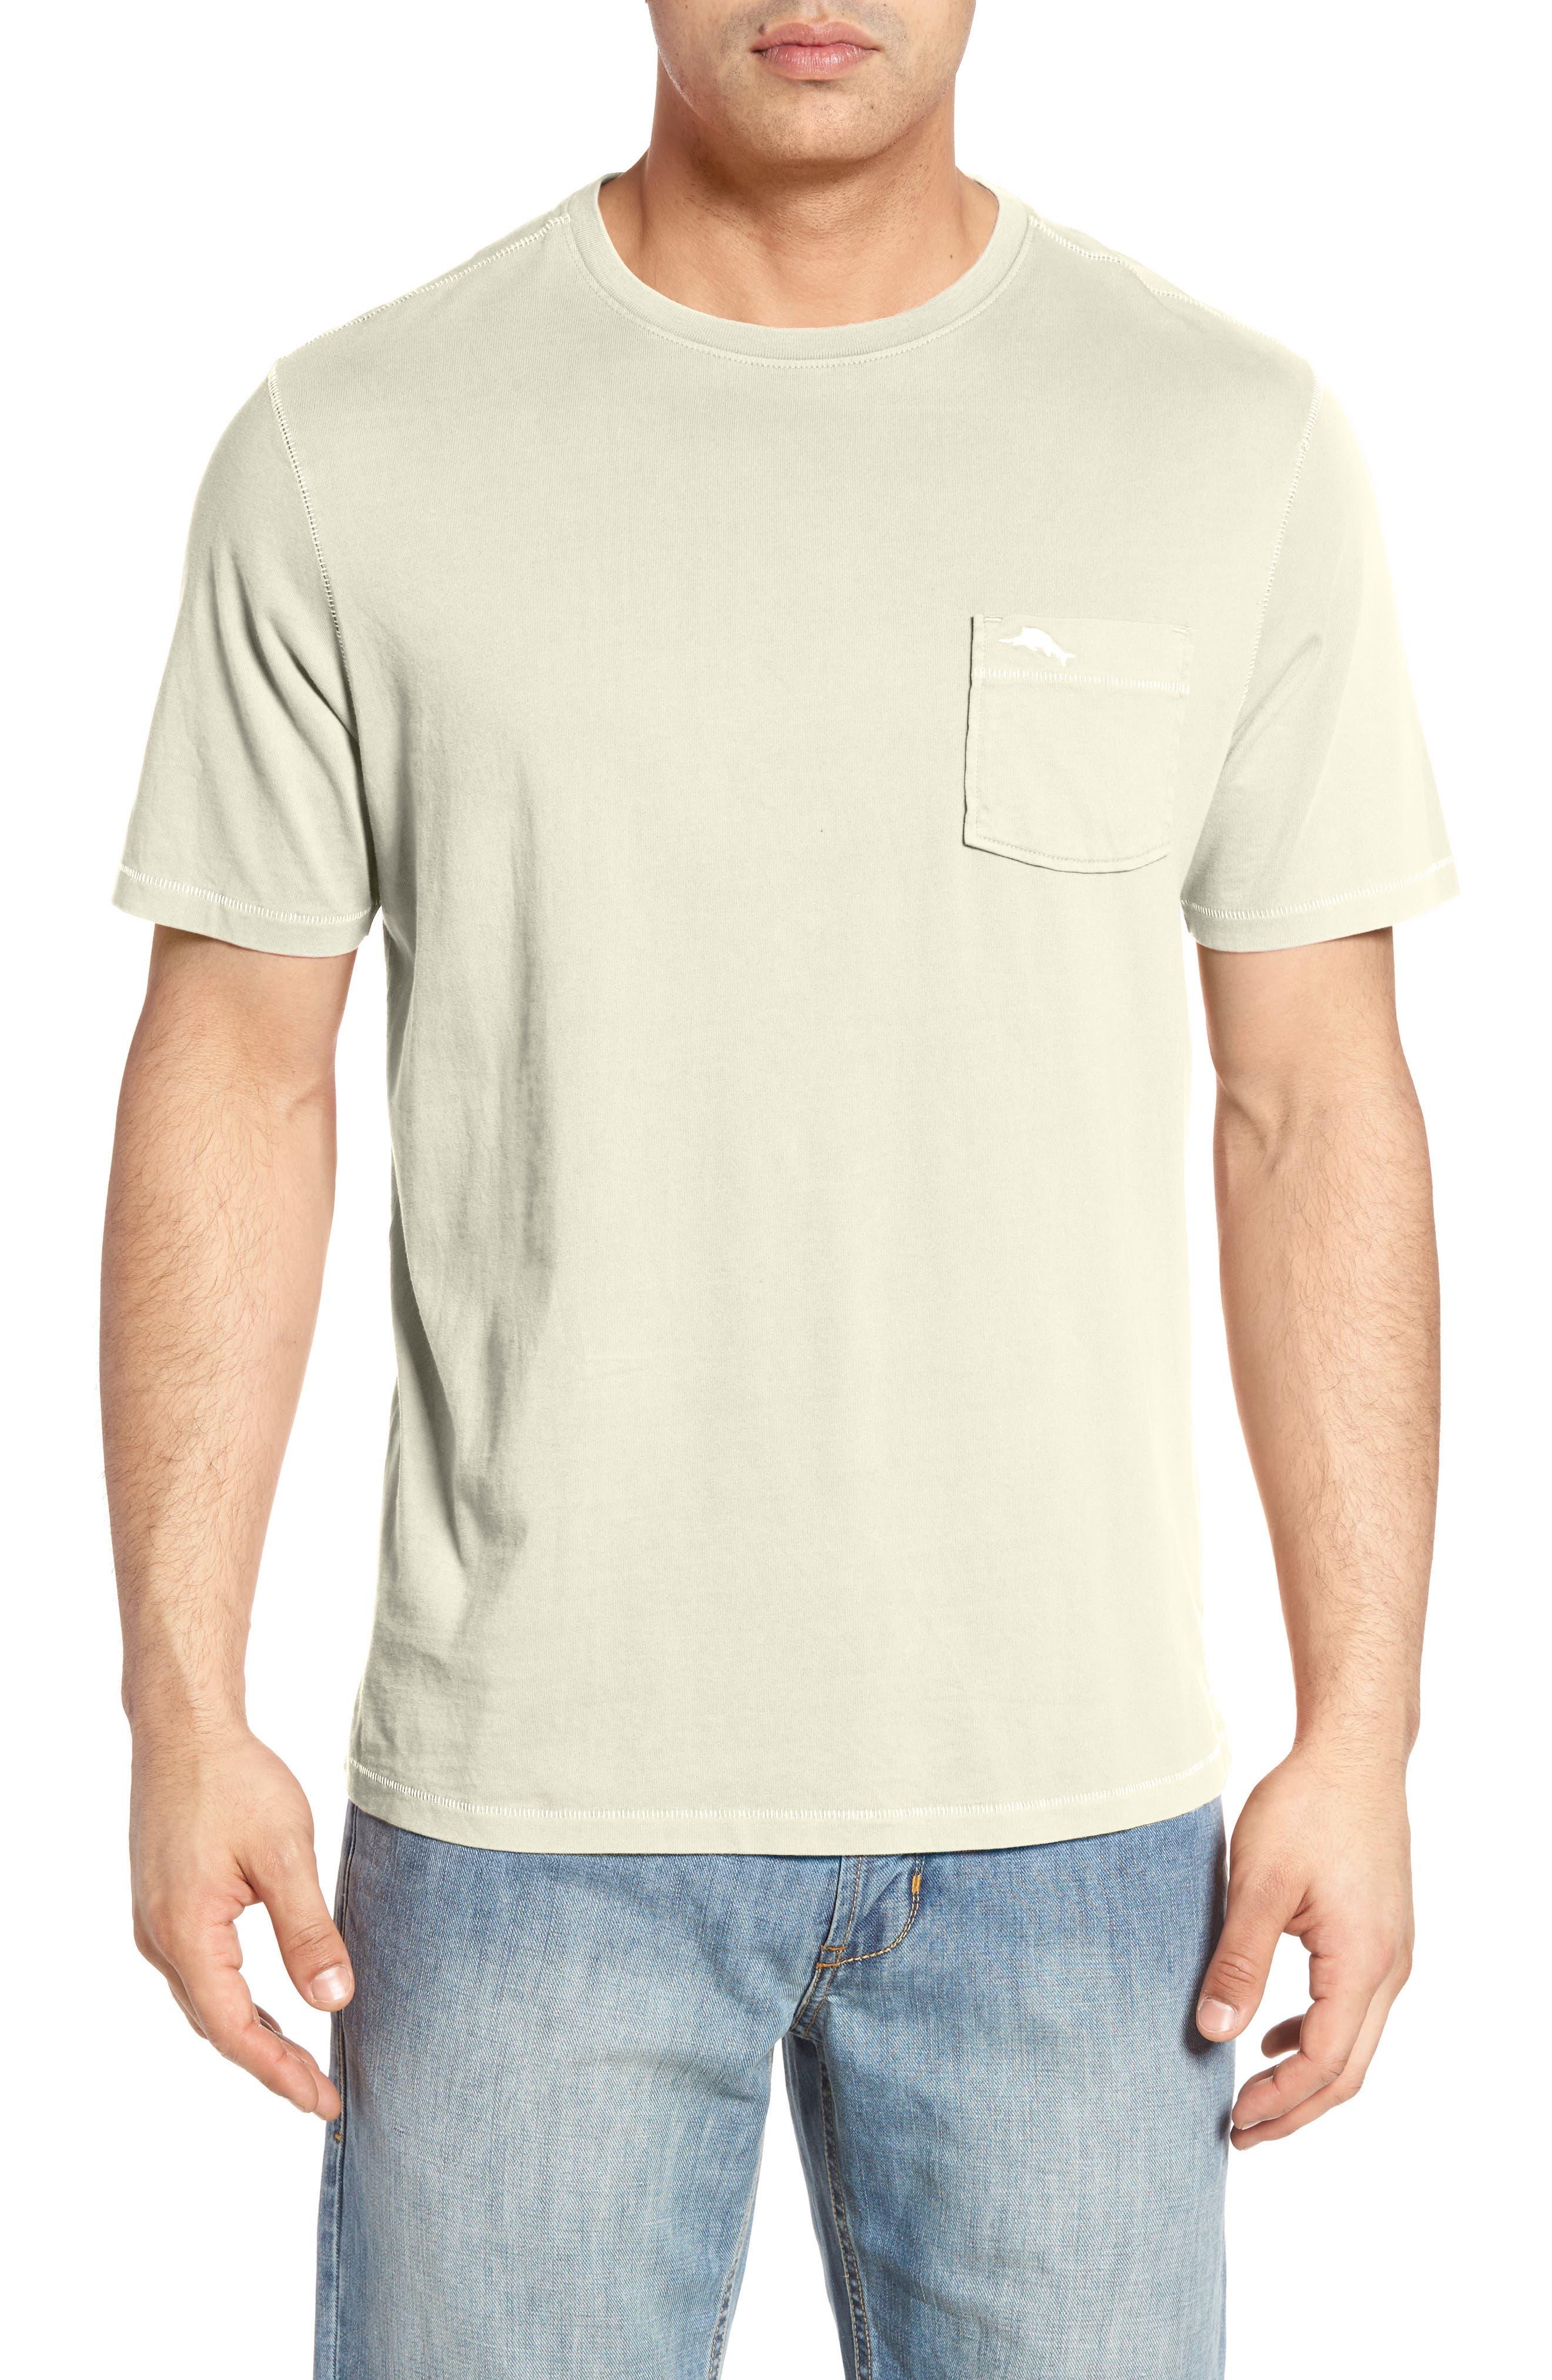 'New Bahama Reef' Island Modern Fit Pima Cotton Pocket T-Shirt,                         Main,                         color, Coconut